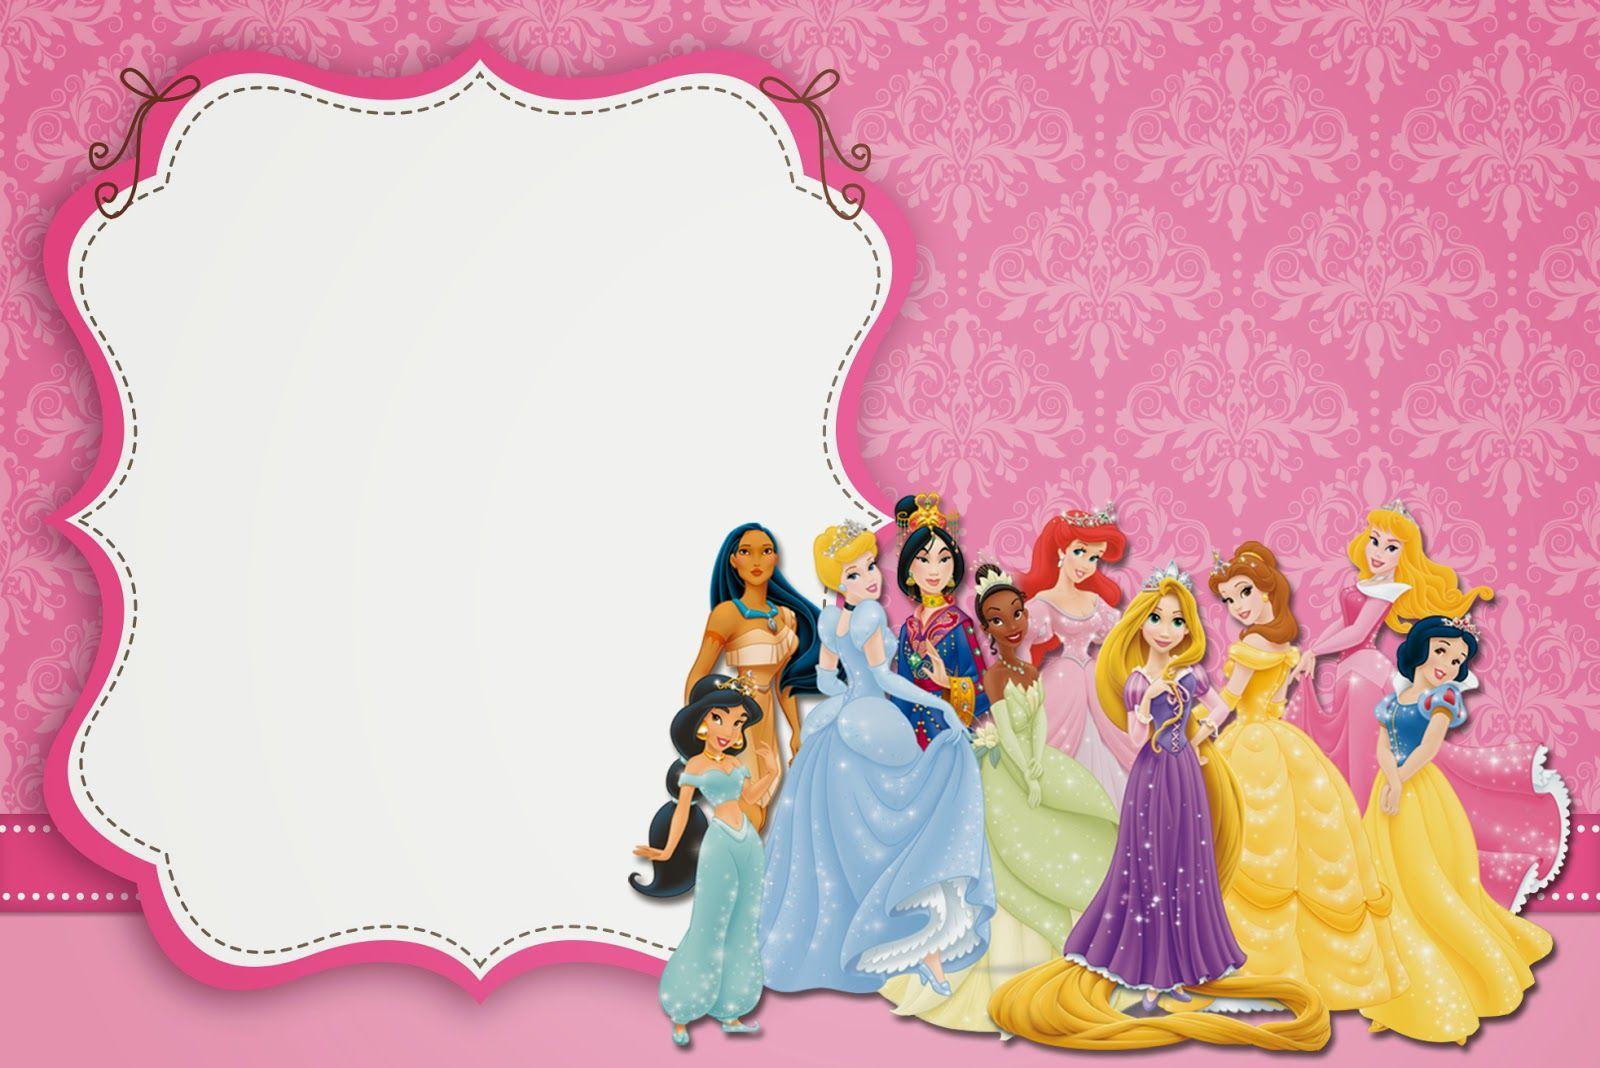 7aff5ca81561 Disney Princess Party  Free Printable Party Invitations.